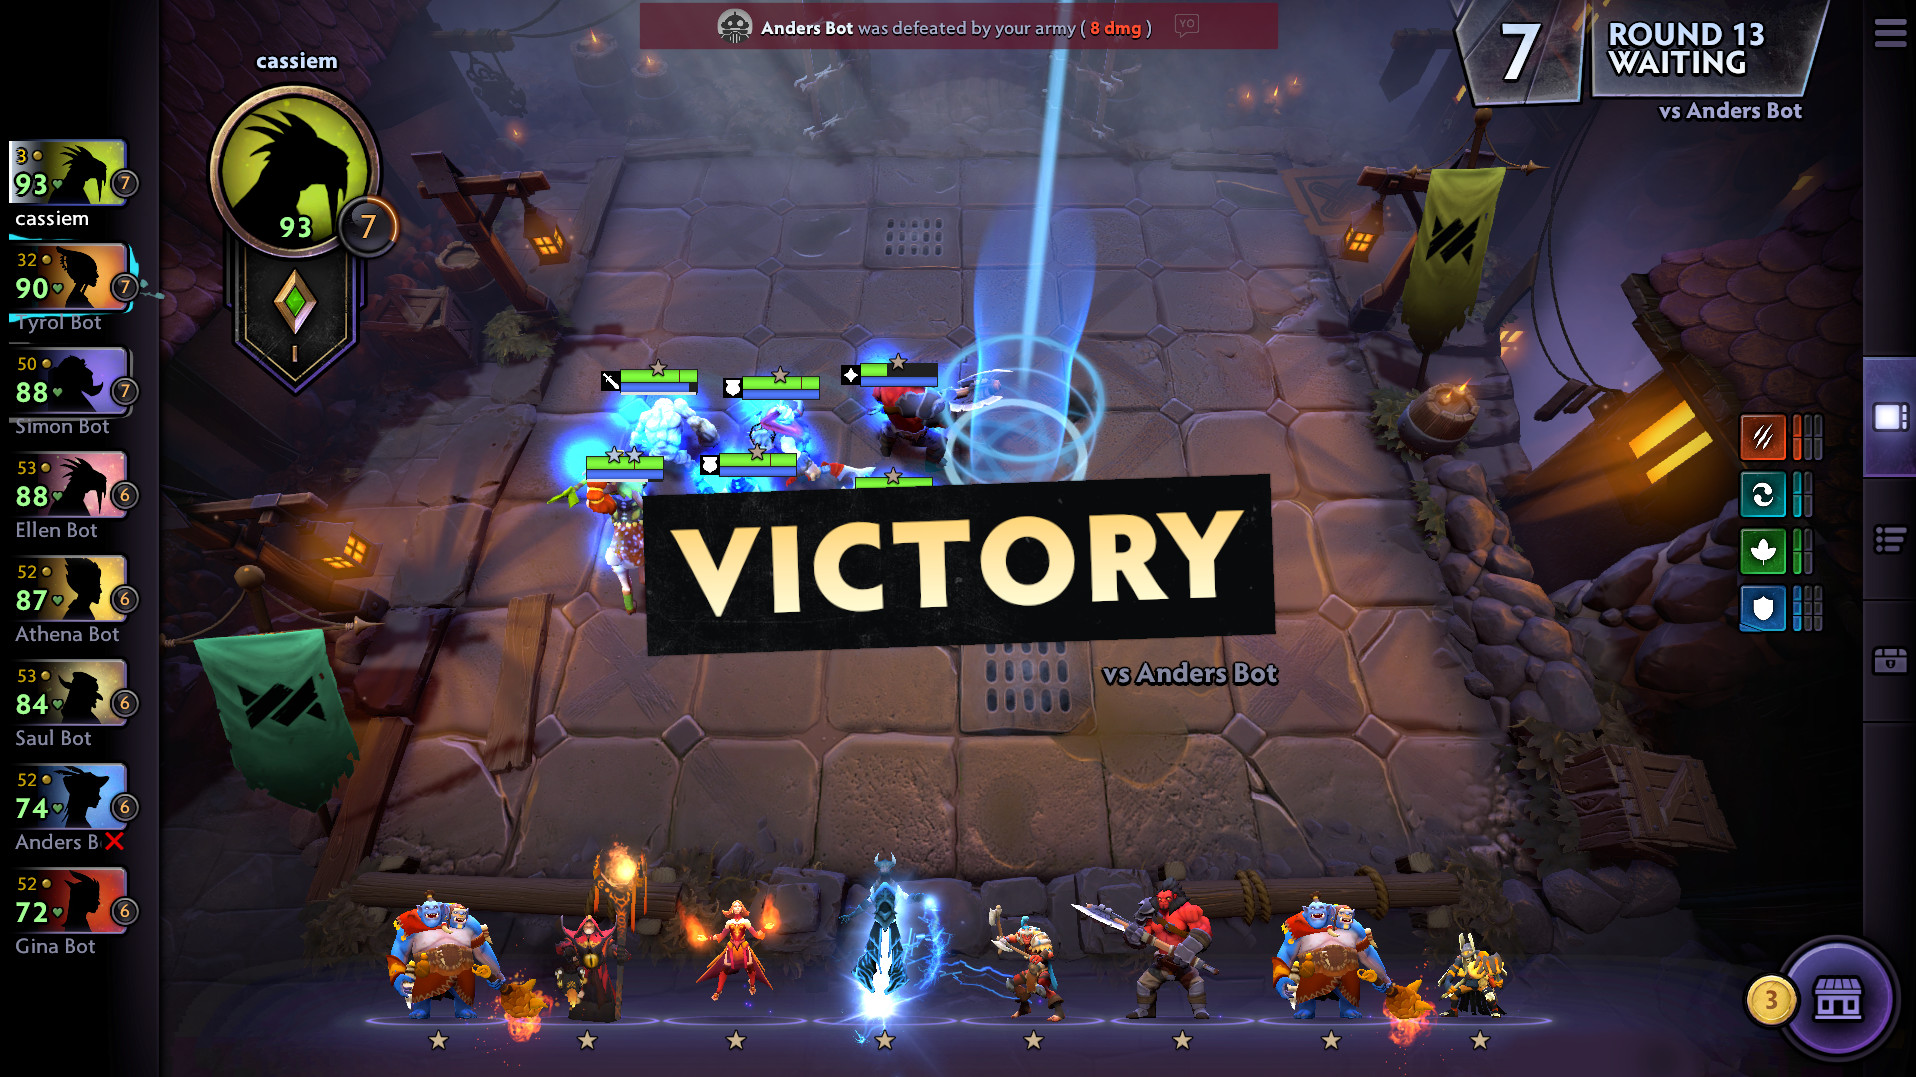 Dota Underlords Victory